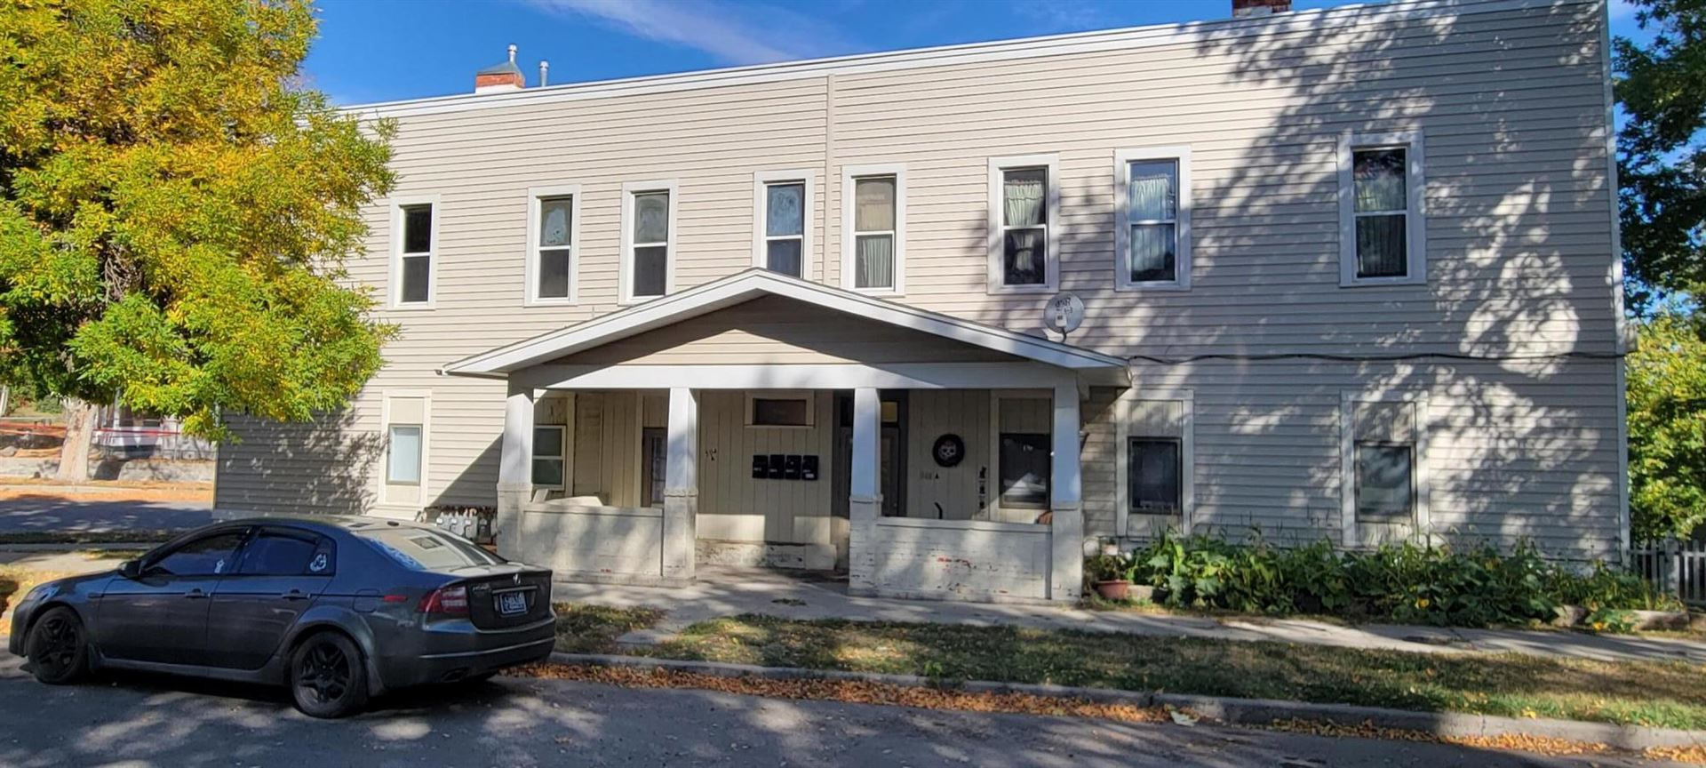 Photo of 504 Breckenridge Street, Helena, MT 59601 (MLS # 22115558)